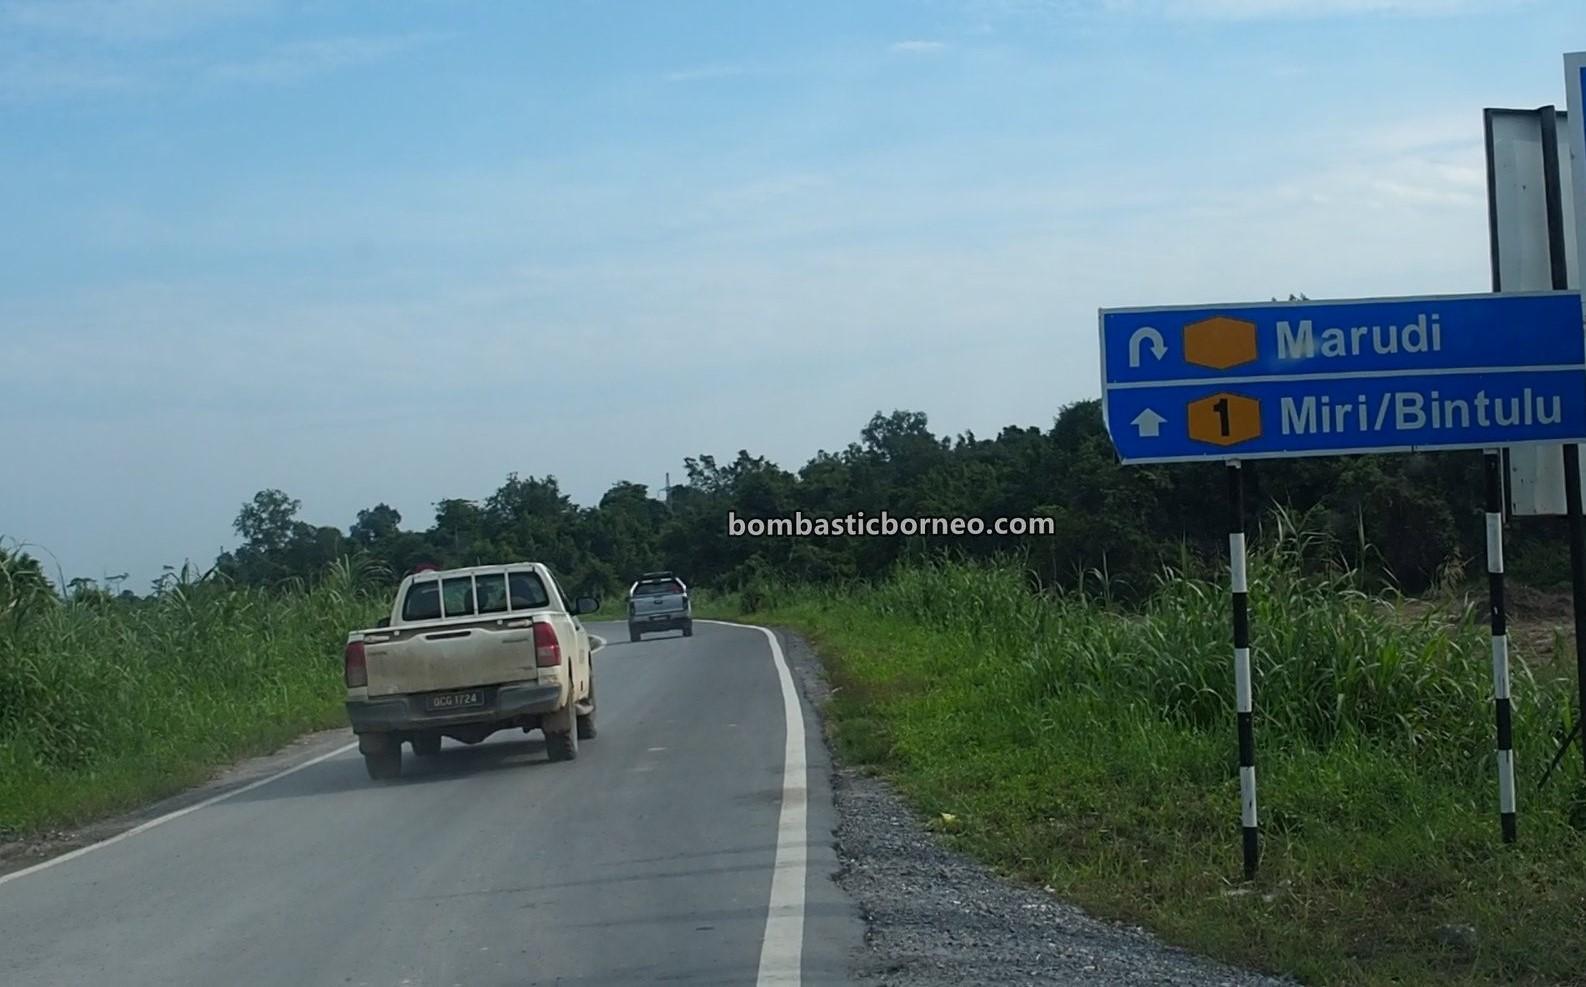 adventure, Trans Border, interior, backpackers, exploration, Tourism, Cross Border, 马来西亚砂拉越, 跨境马鲁帝美里